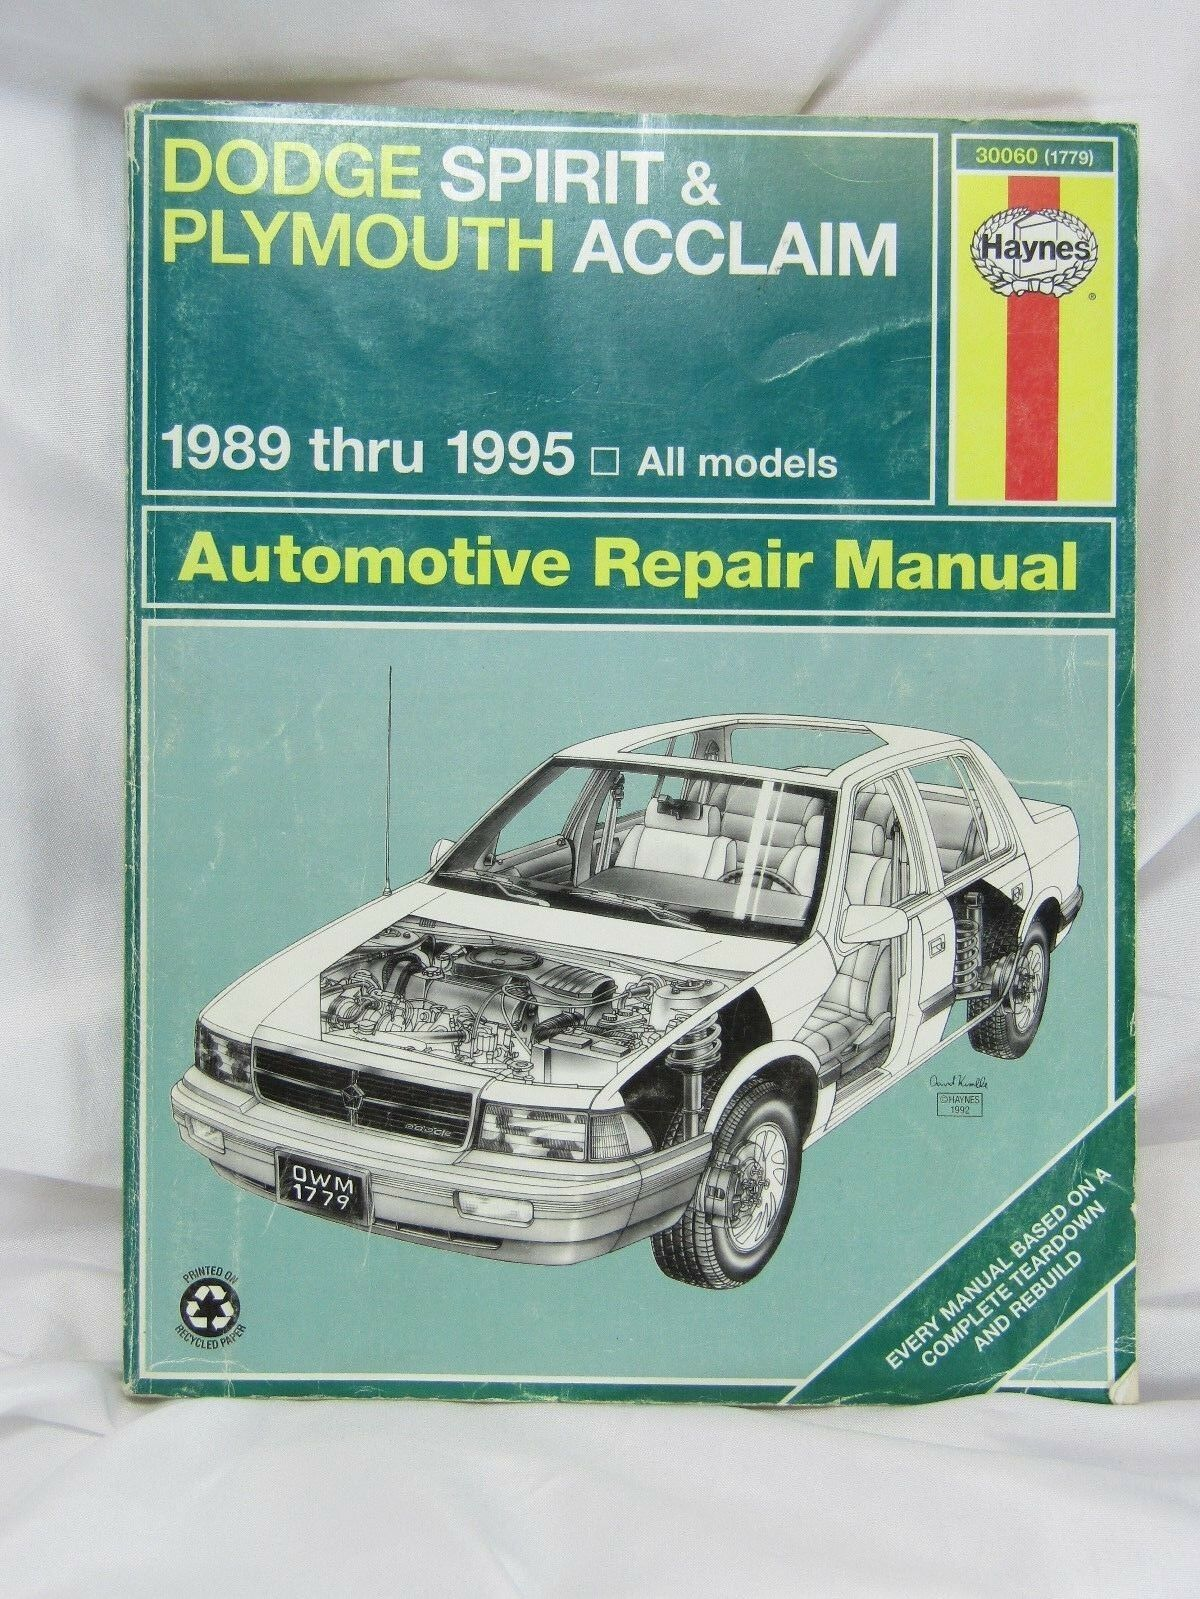 Haynes Repair Manual Dodge Spirit Plymouth Acclaim 1989 Thru 1995 Car Auto  30060 | eBay